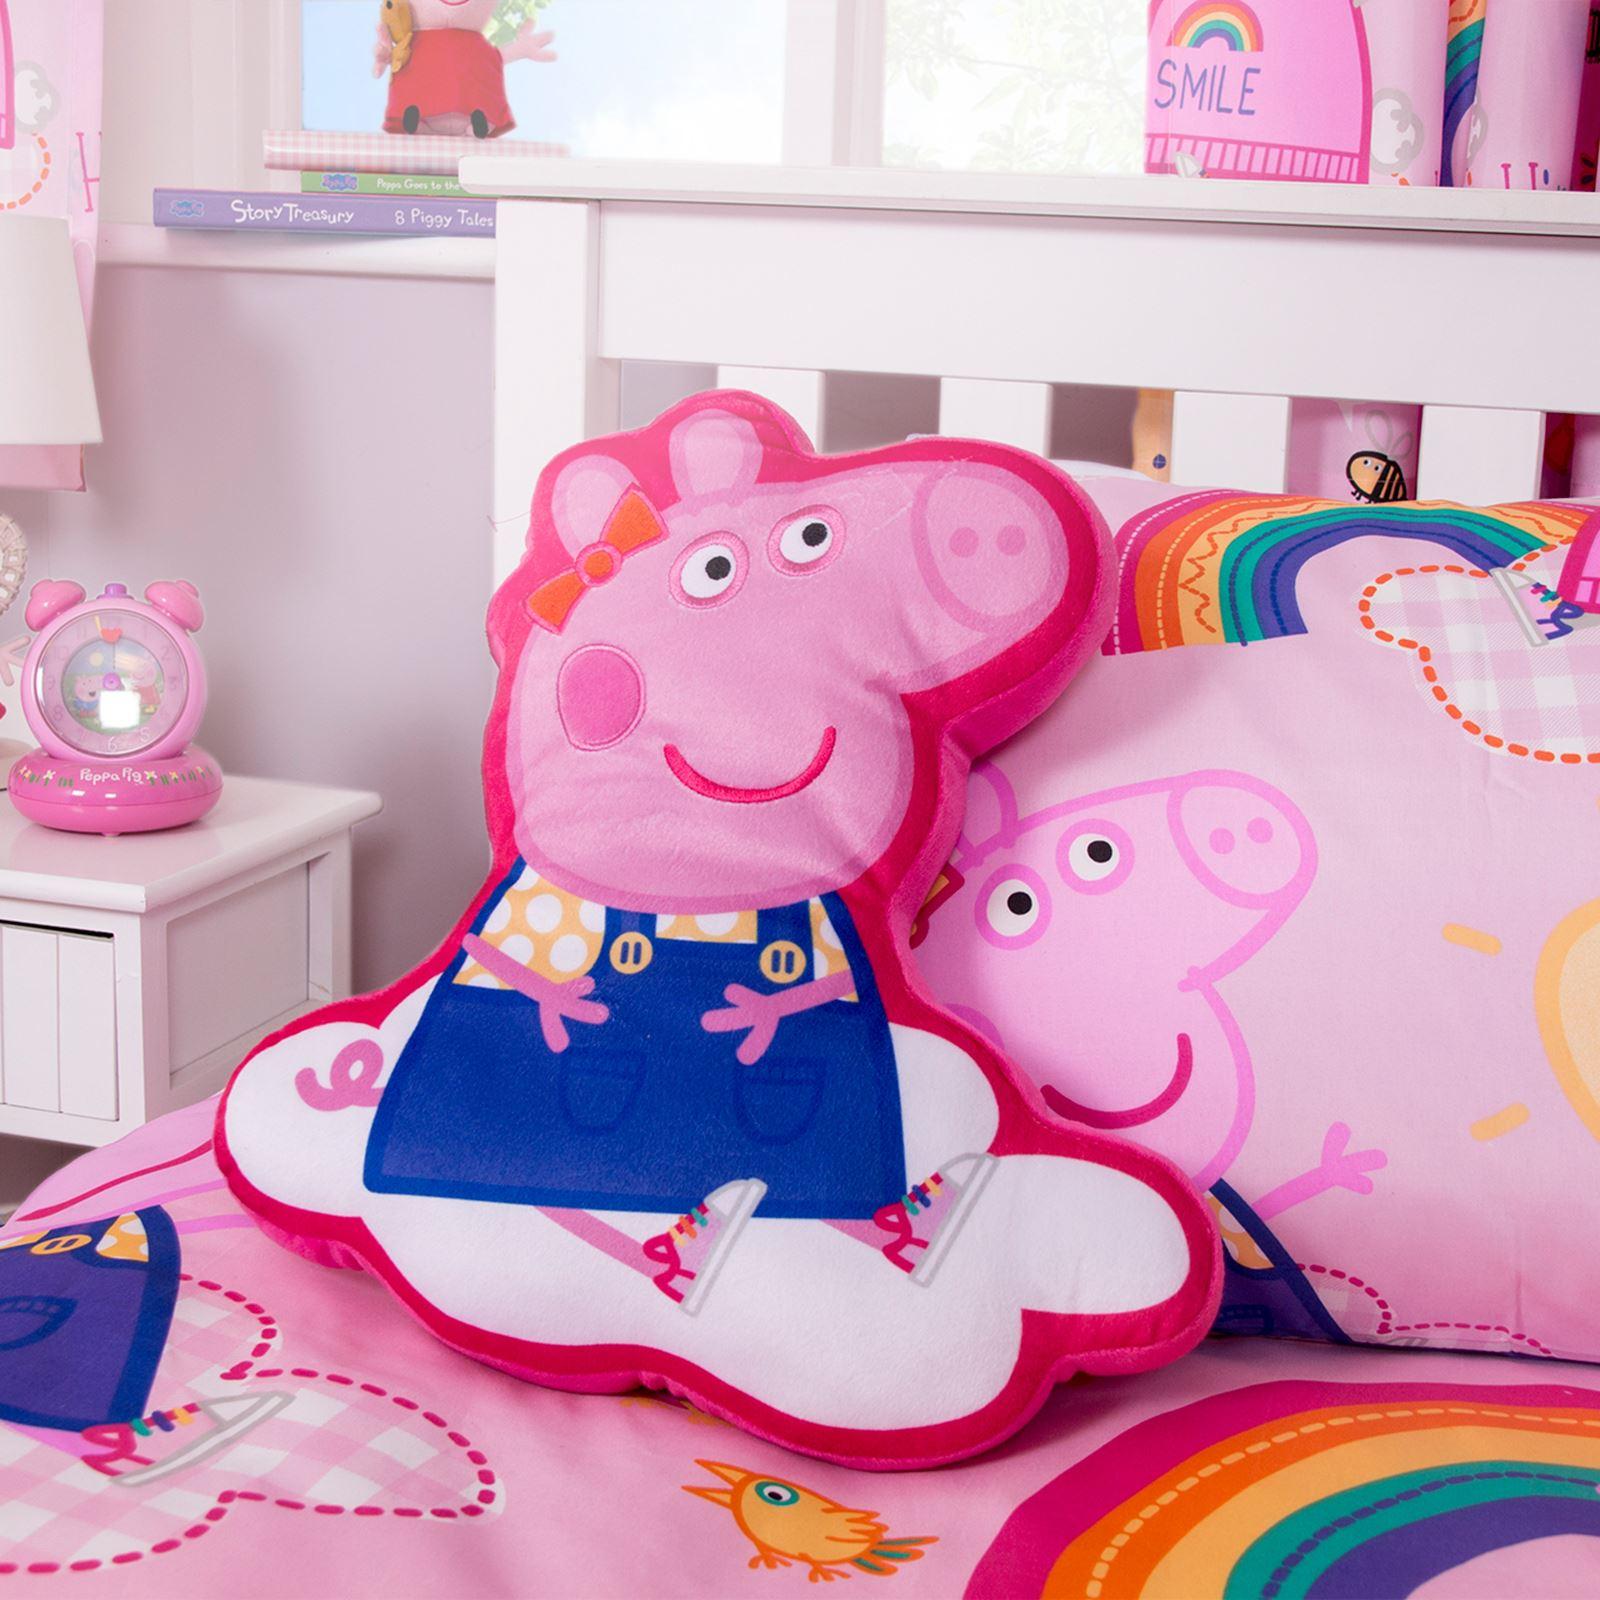 GIRLS CHILDRENS   RAINBOW PEPPA PIG    BEDROOM PILLOW FILLED CUSHIONS 40 x 40 cm